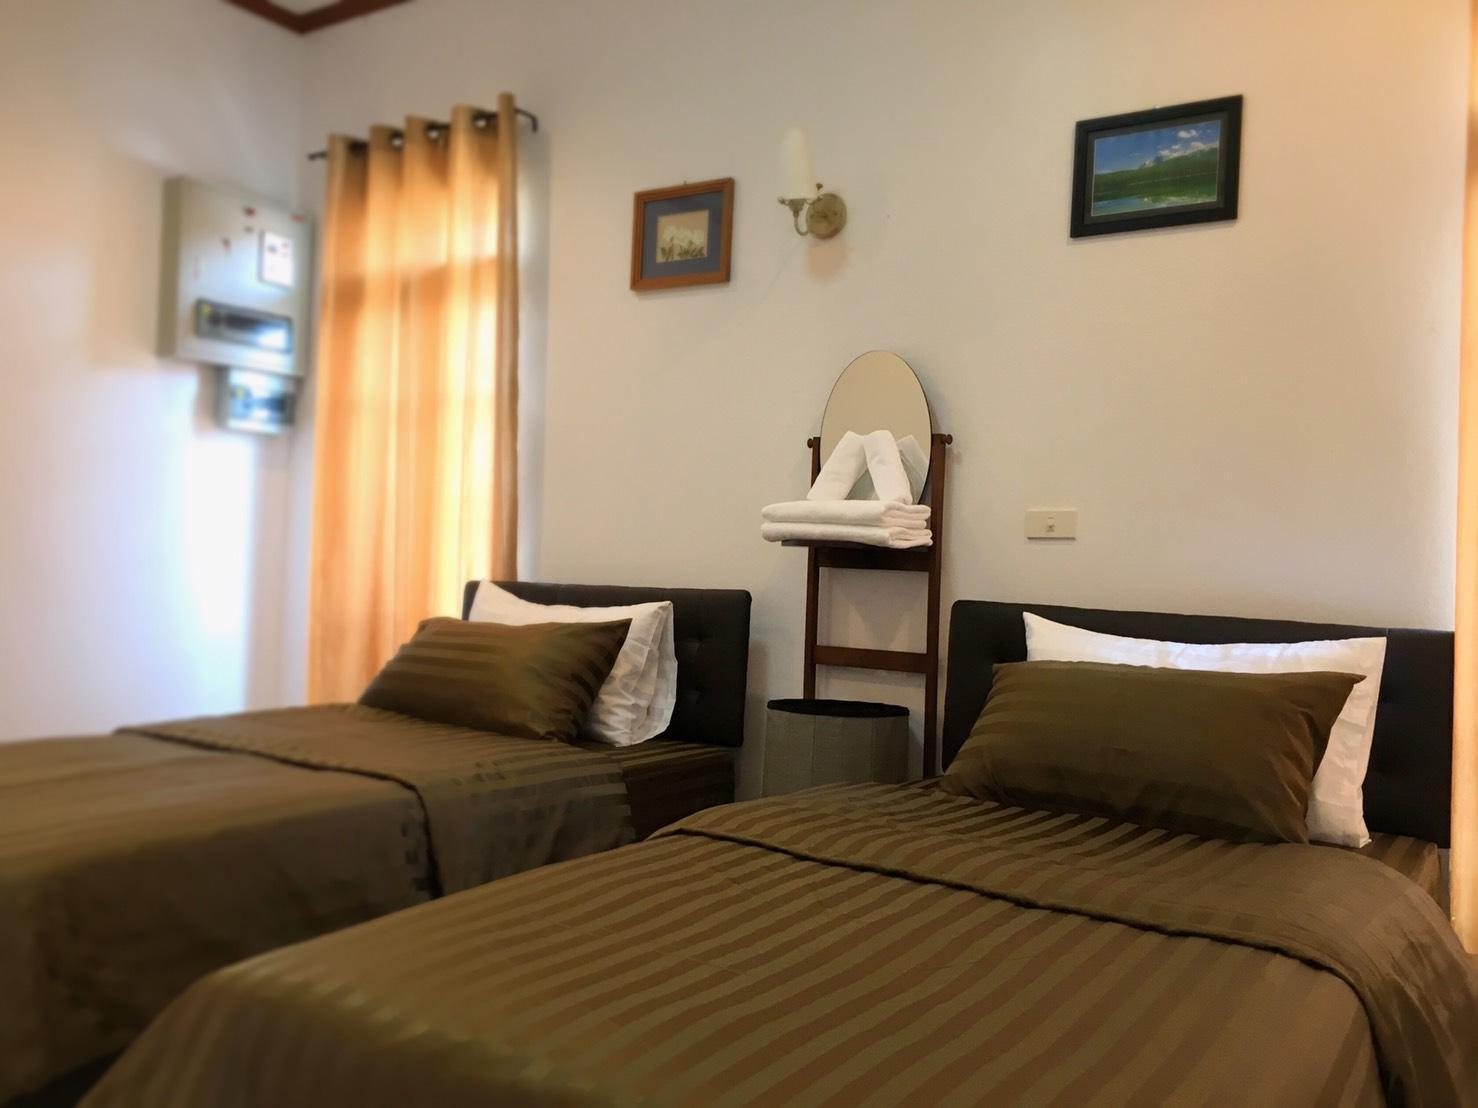 The Coco Phala Villa วิลลา 4 ห้องนอน 3 ห้องน้ำส่วนตัว ขนาด 200 ตร.ม. – หาดระยอง